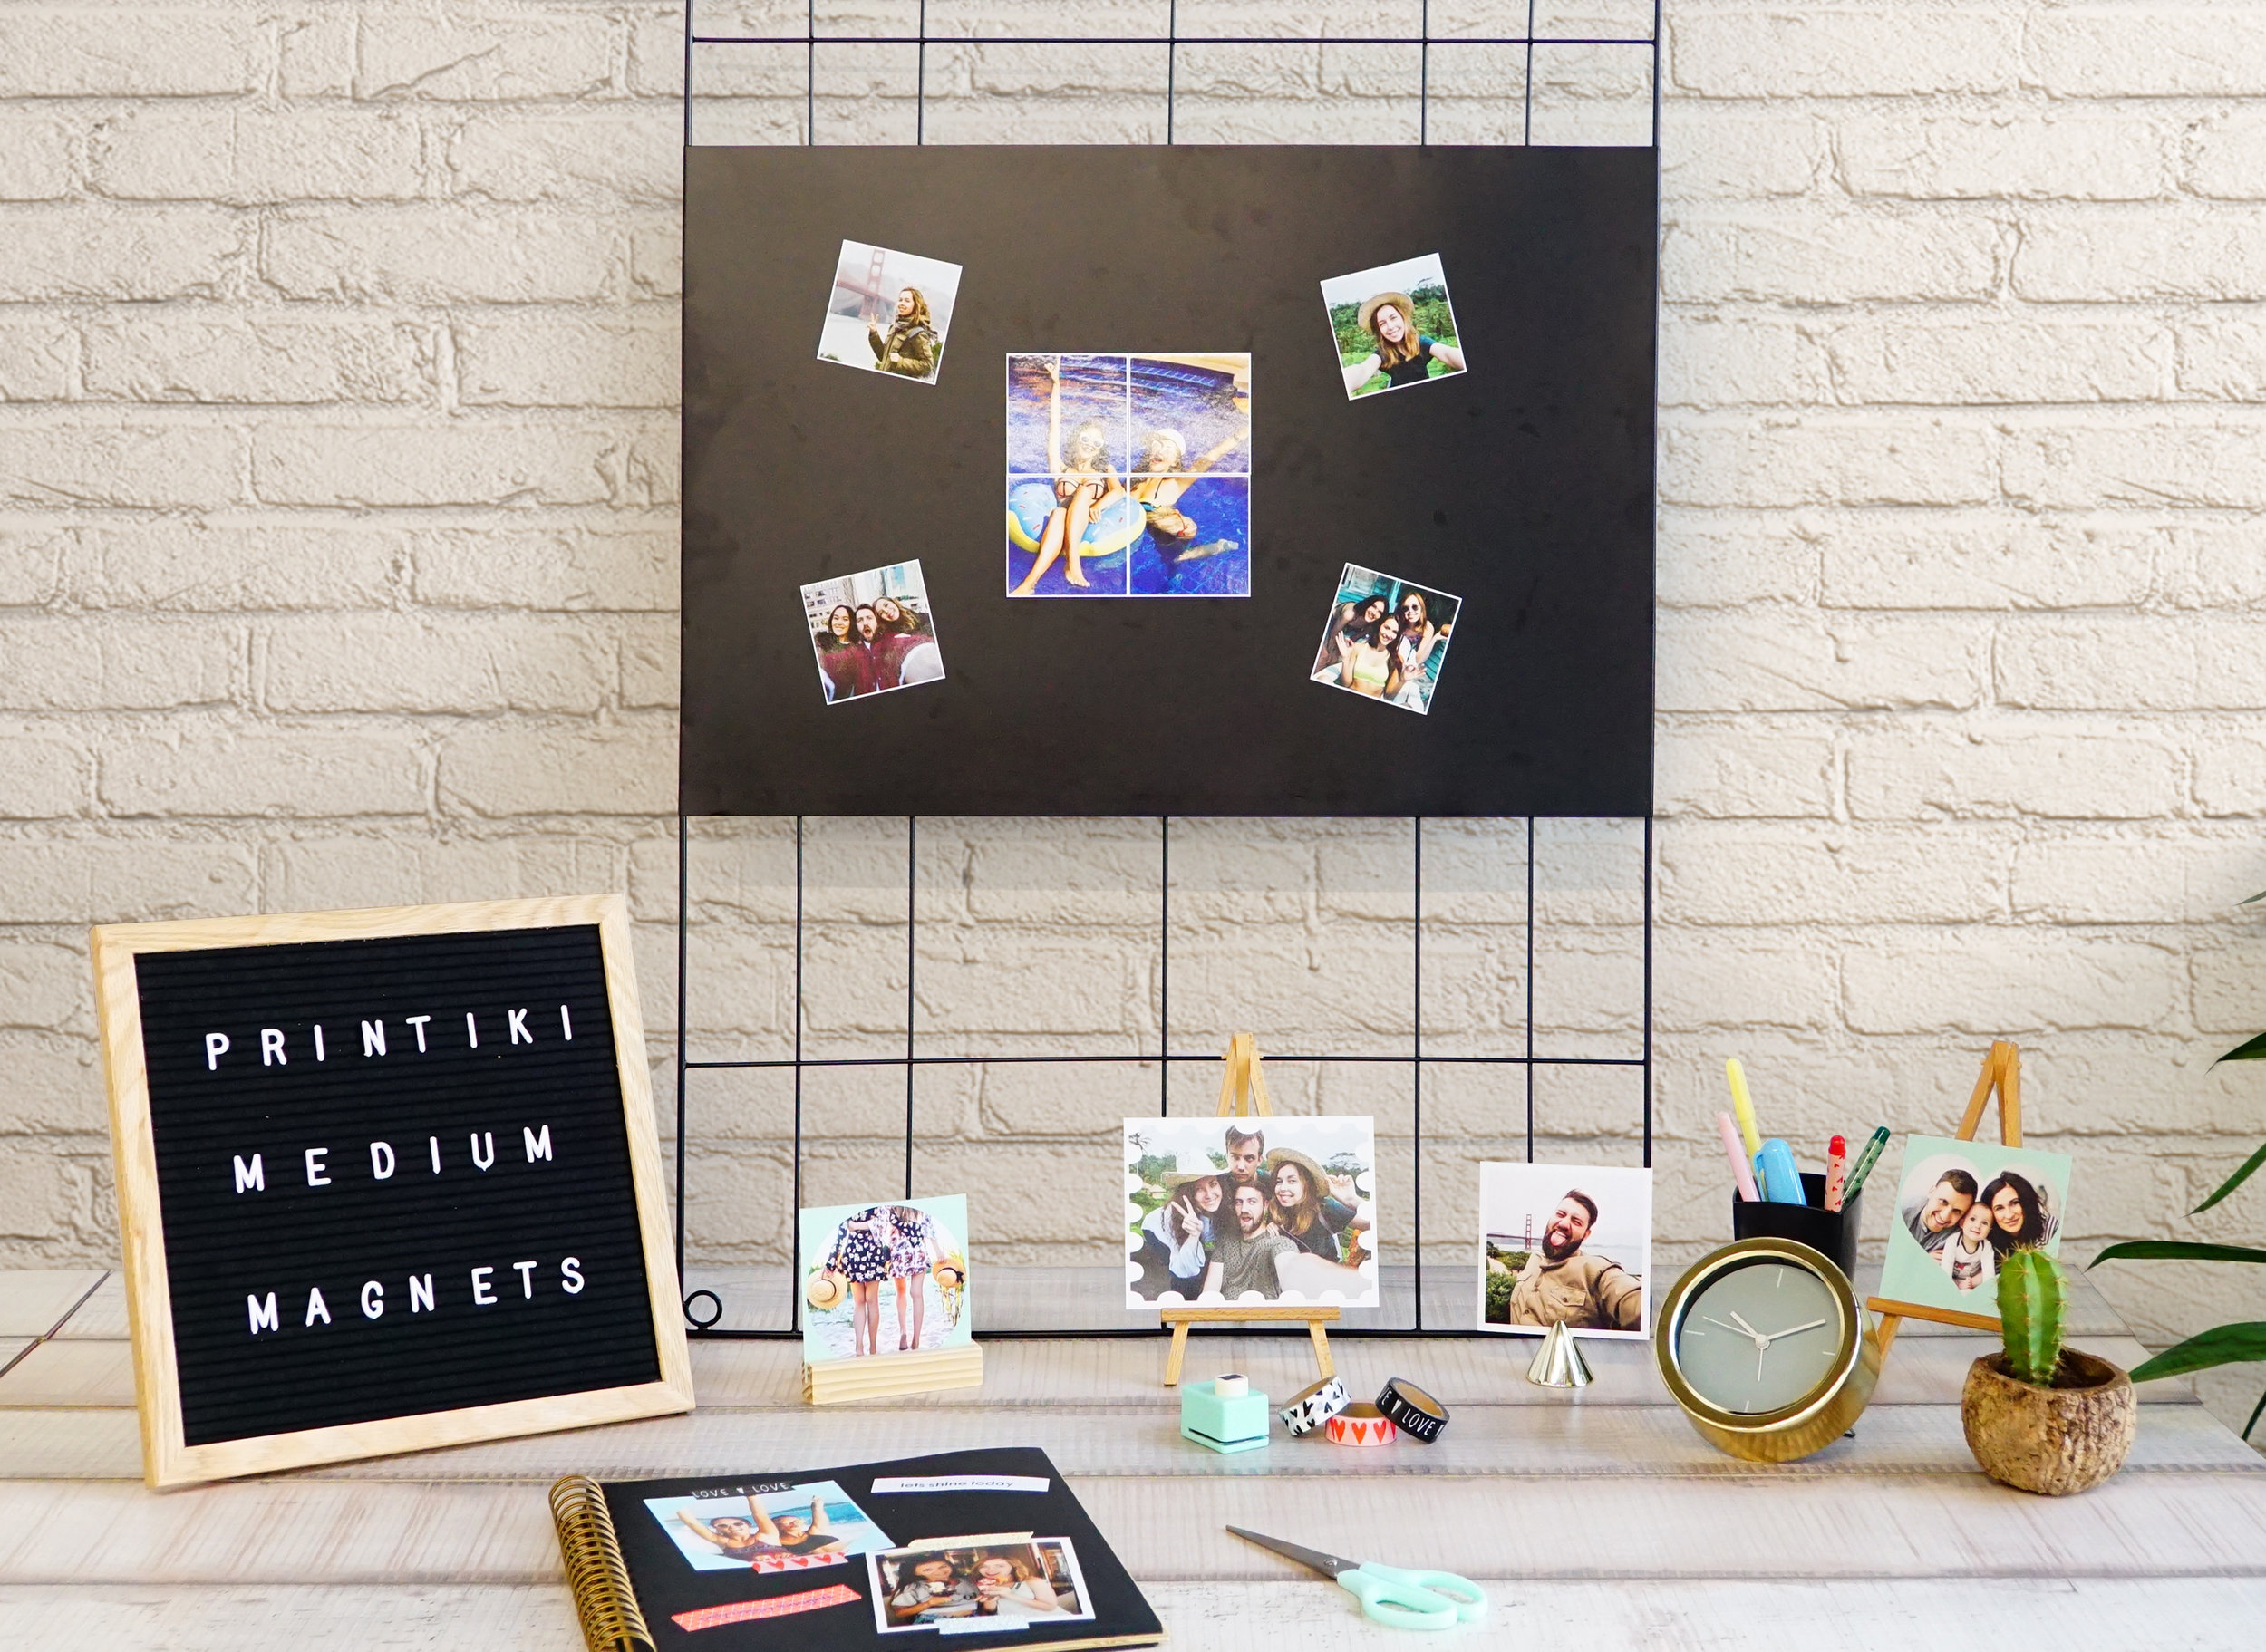 MEDIUM-Magnets-Home-decor.jpg